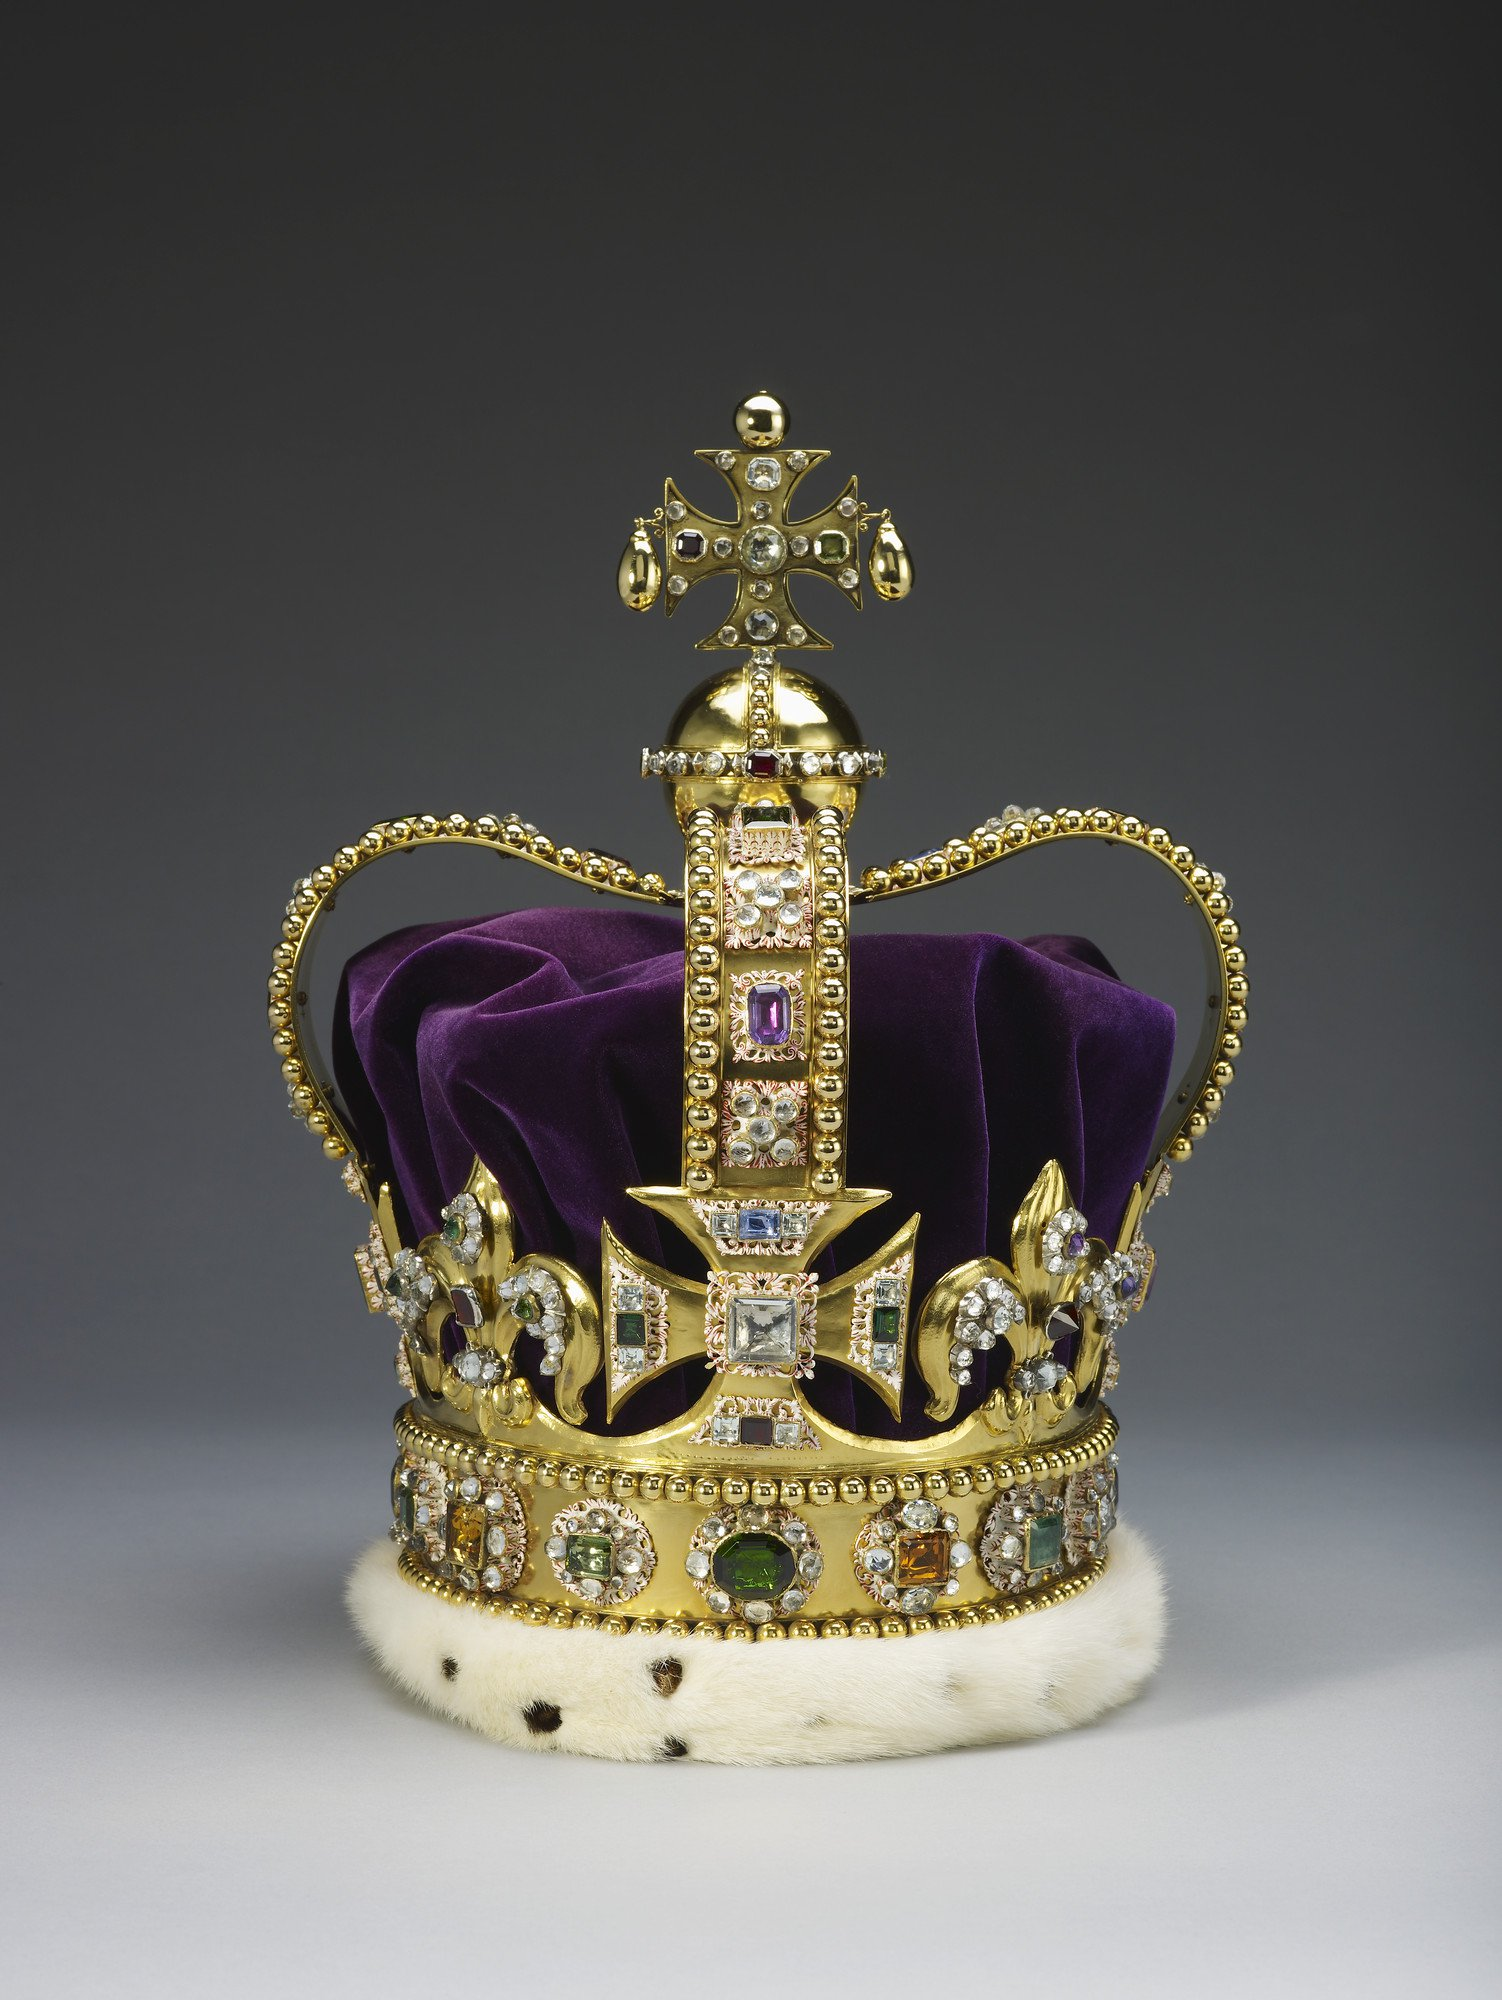 st edwards crown